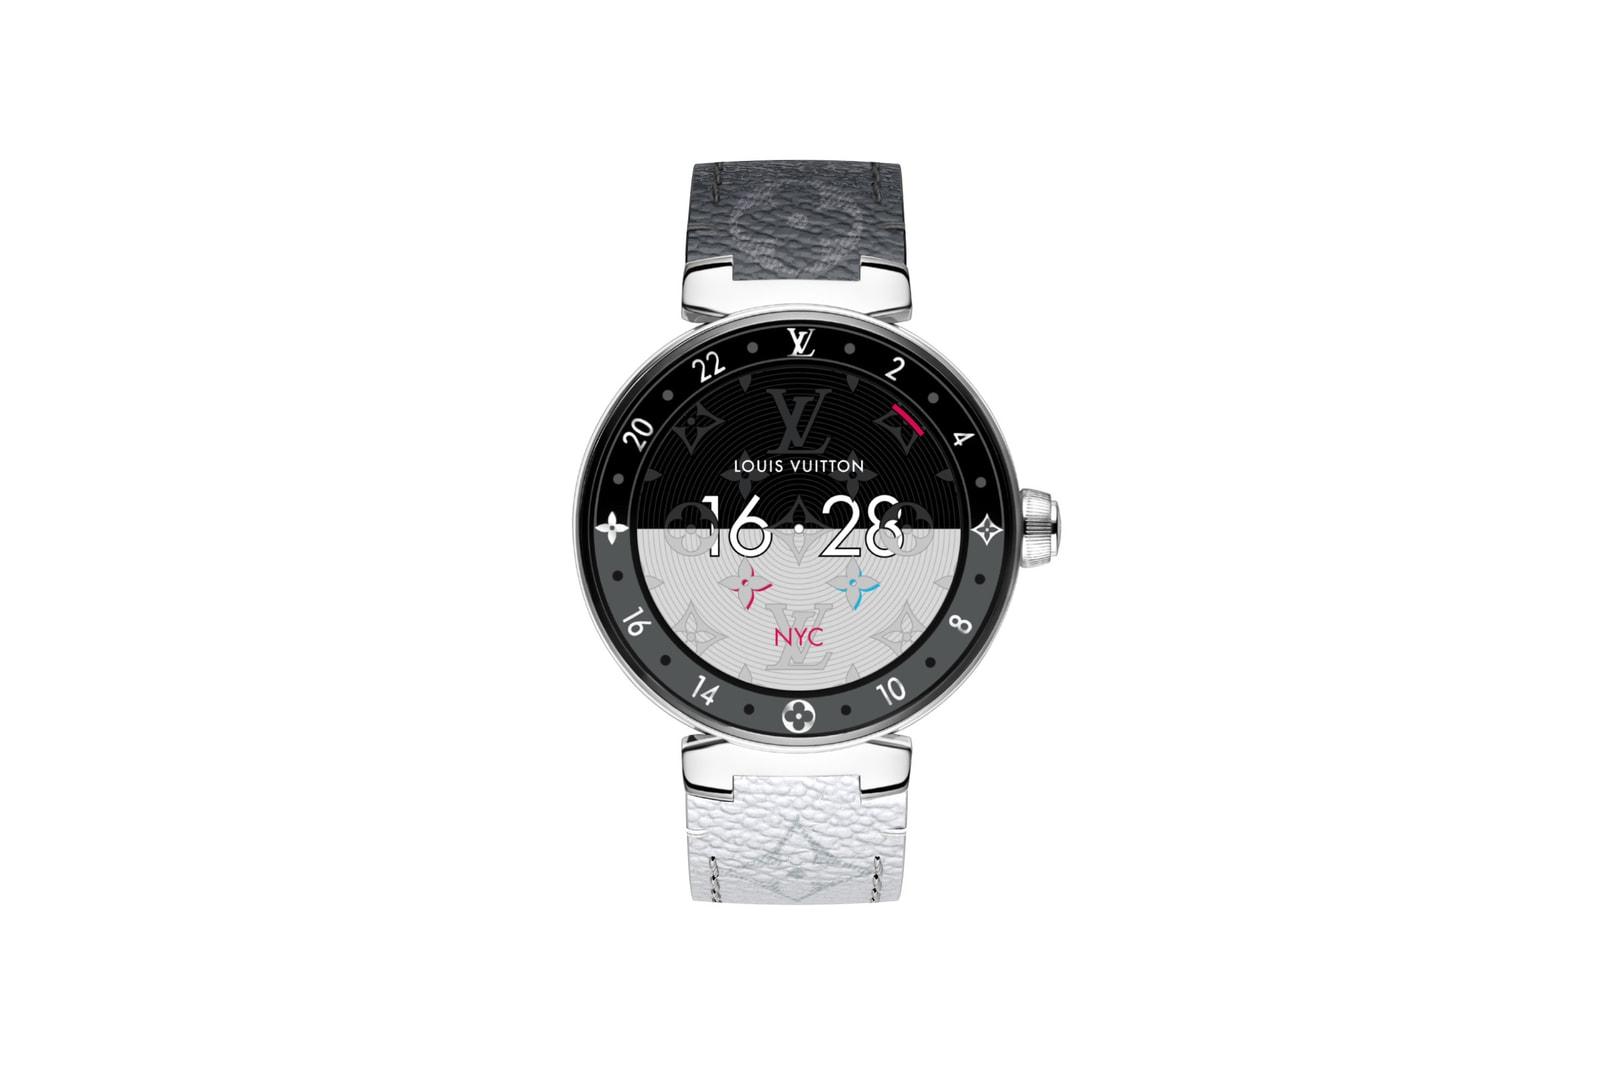 Louis Vuitton 正式帶來 Tambour Horizon 智能腕錶及 Horizon Earphones